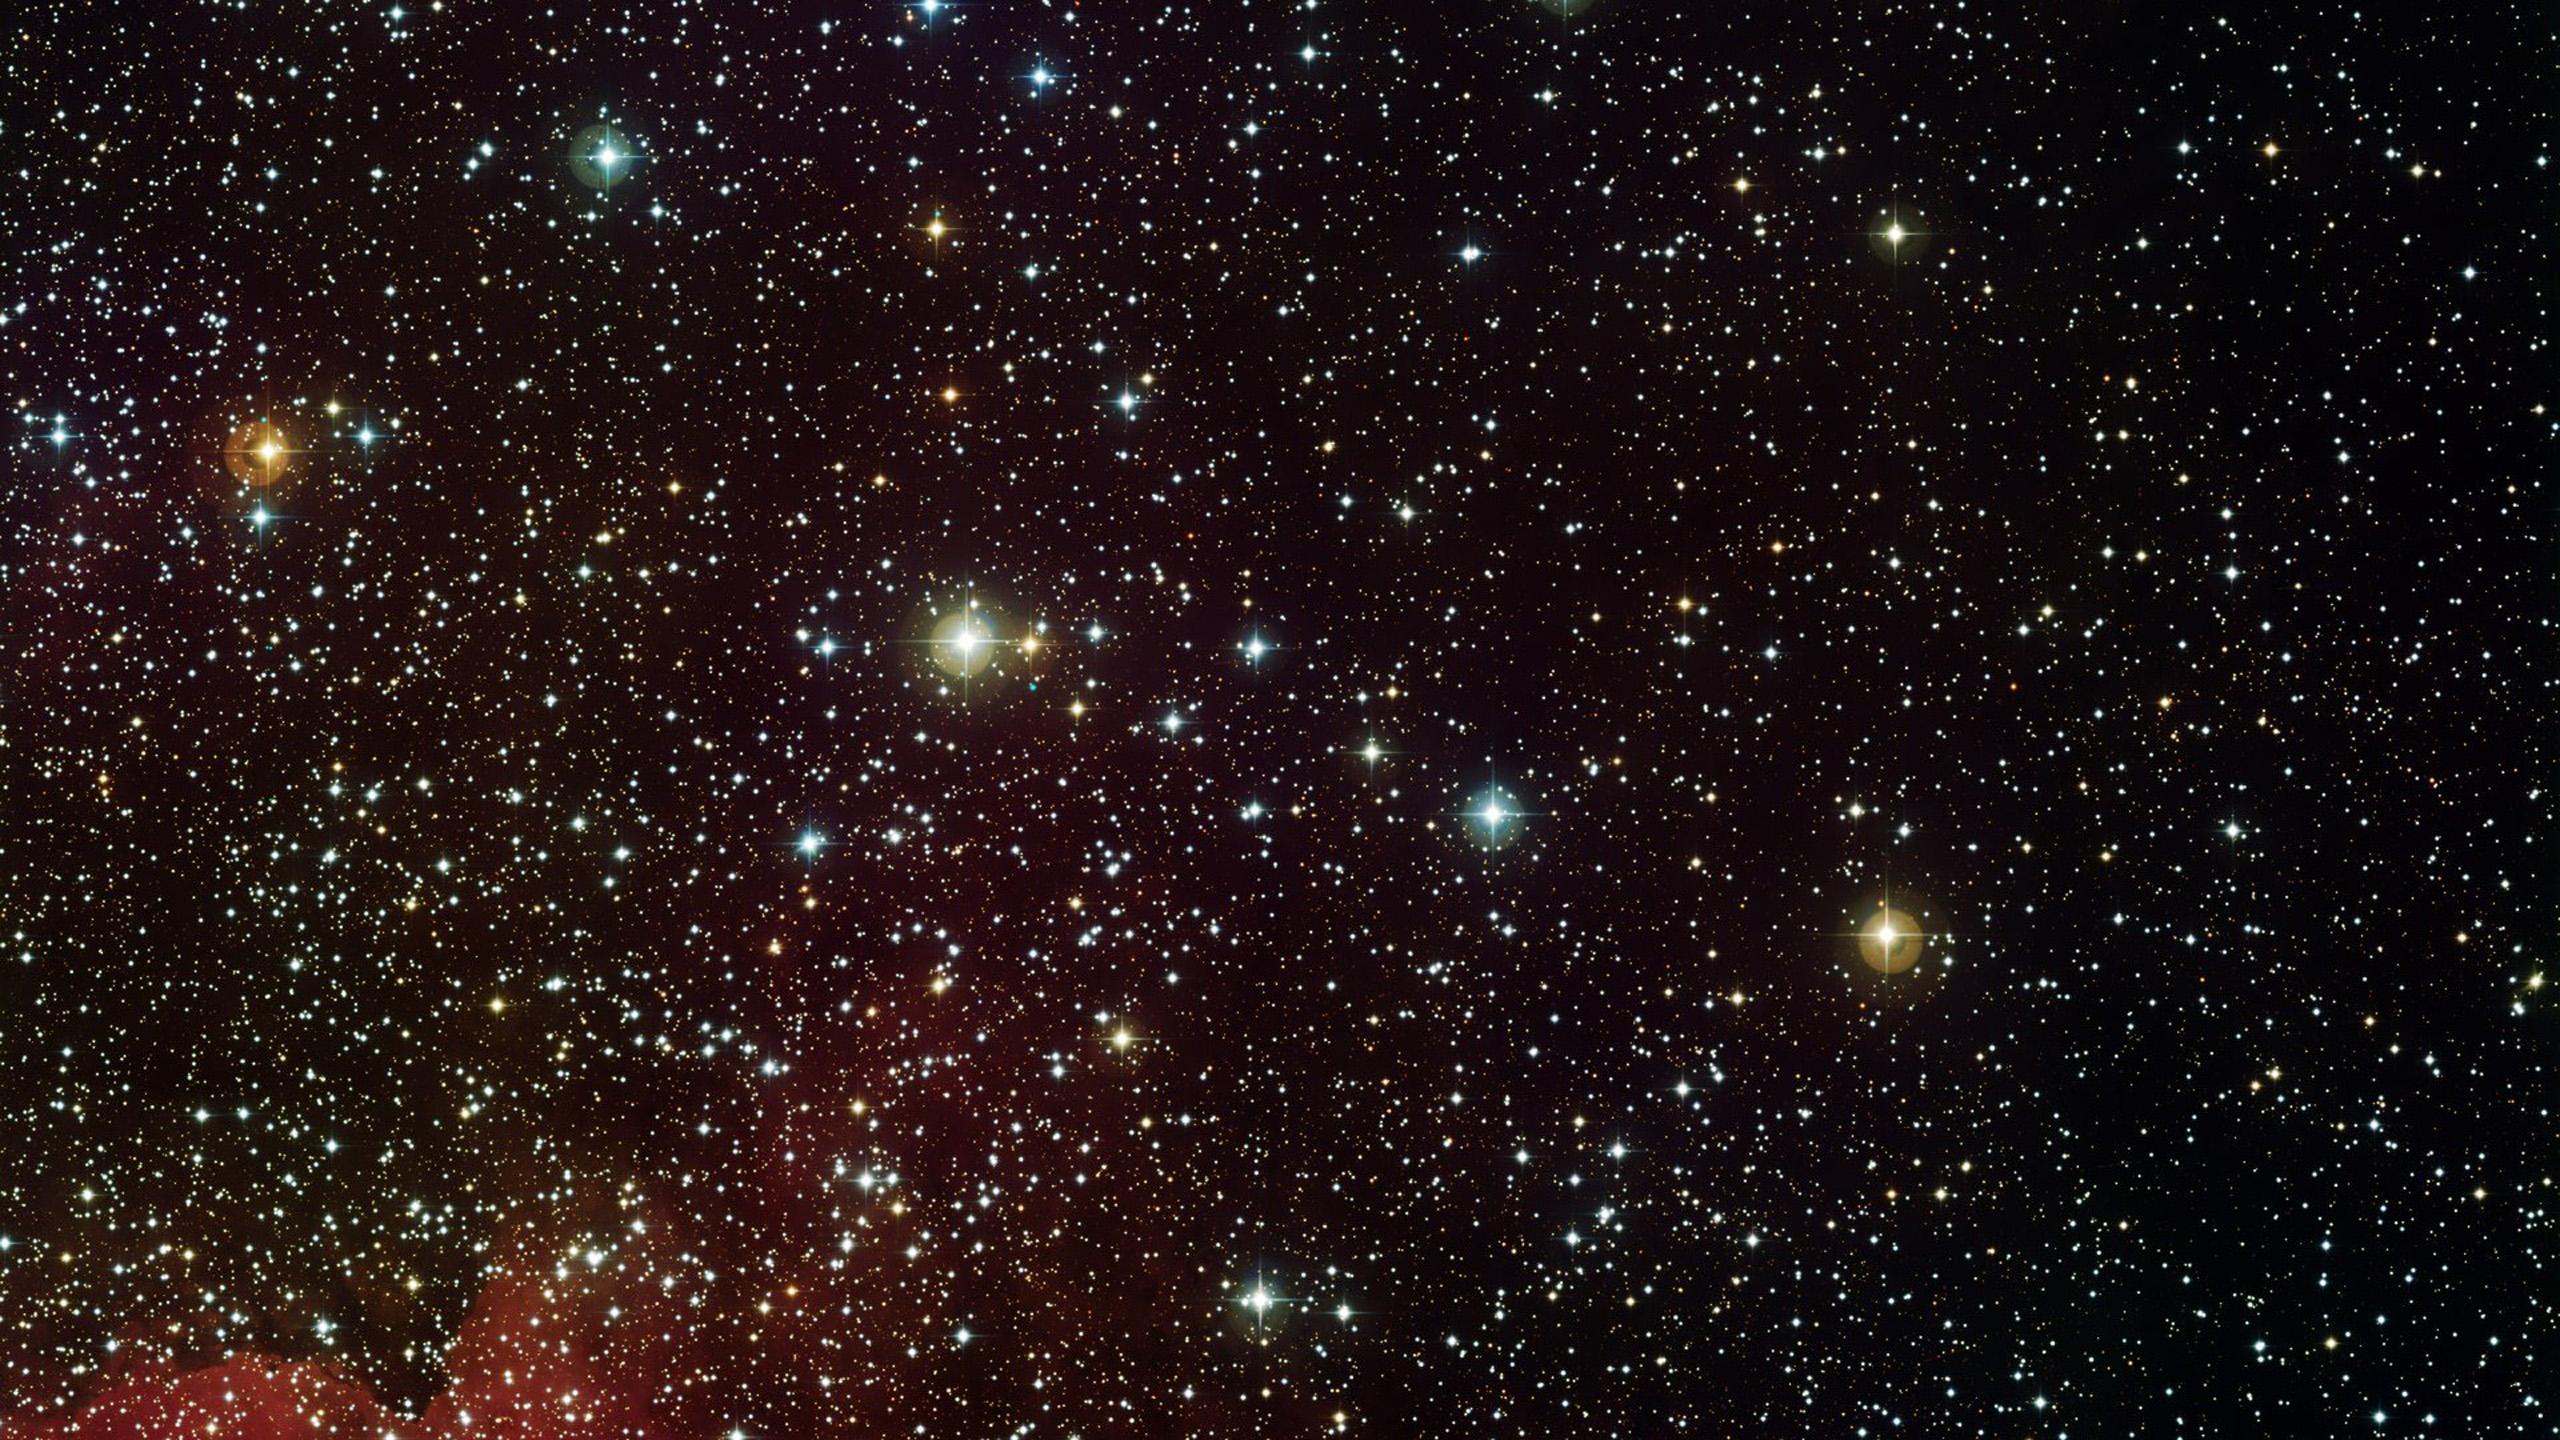 Звездное небо картинки, смешная картинка